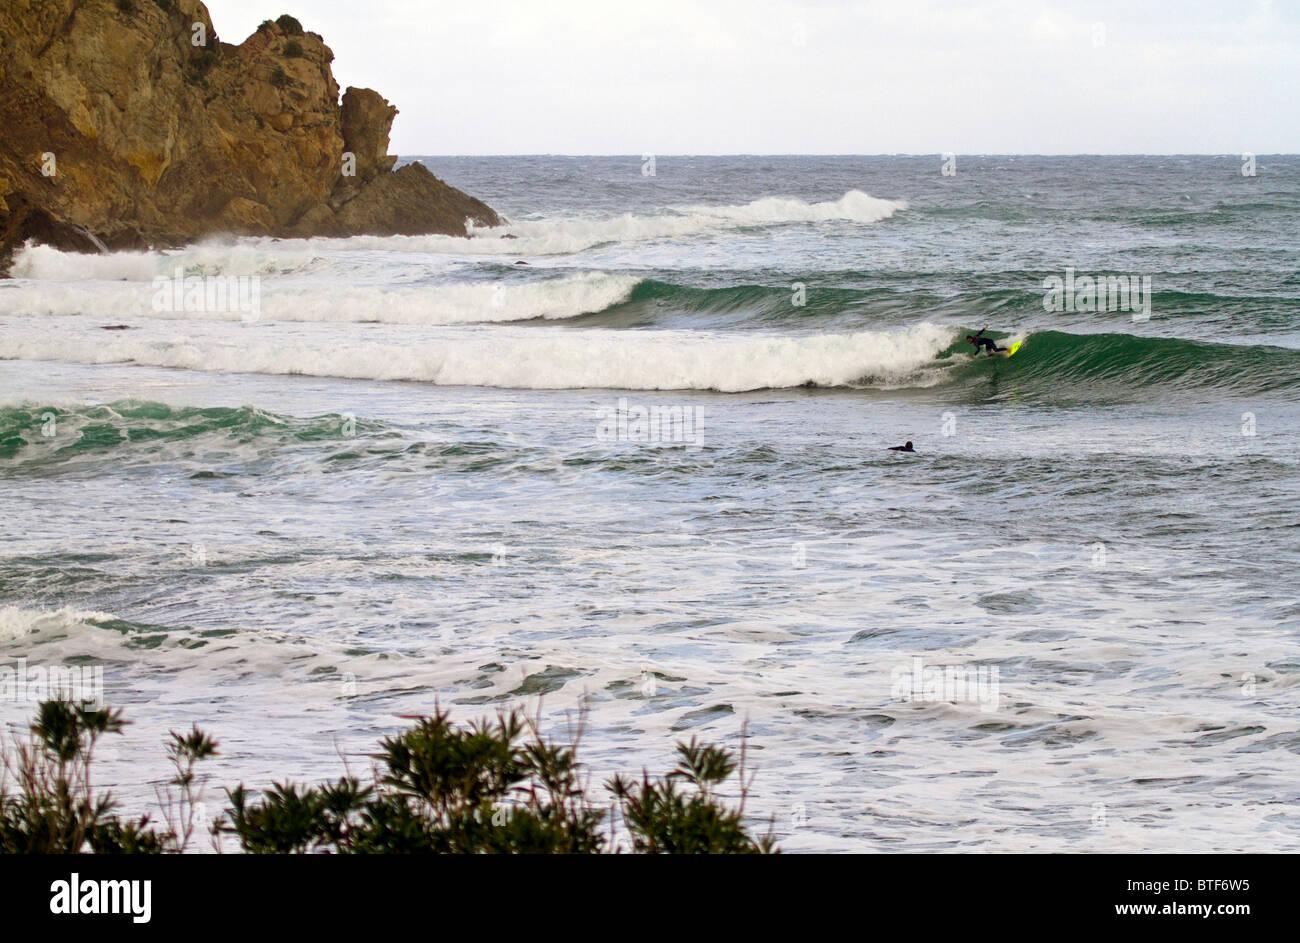 Tunisia Surfing Mediterranean Sea Stock Photo 32296801